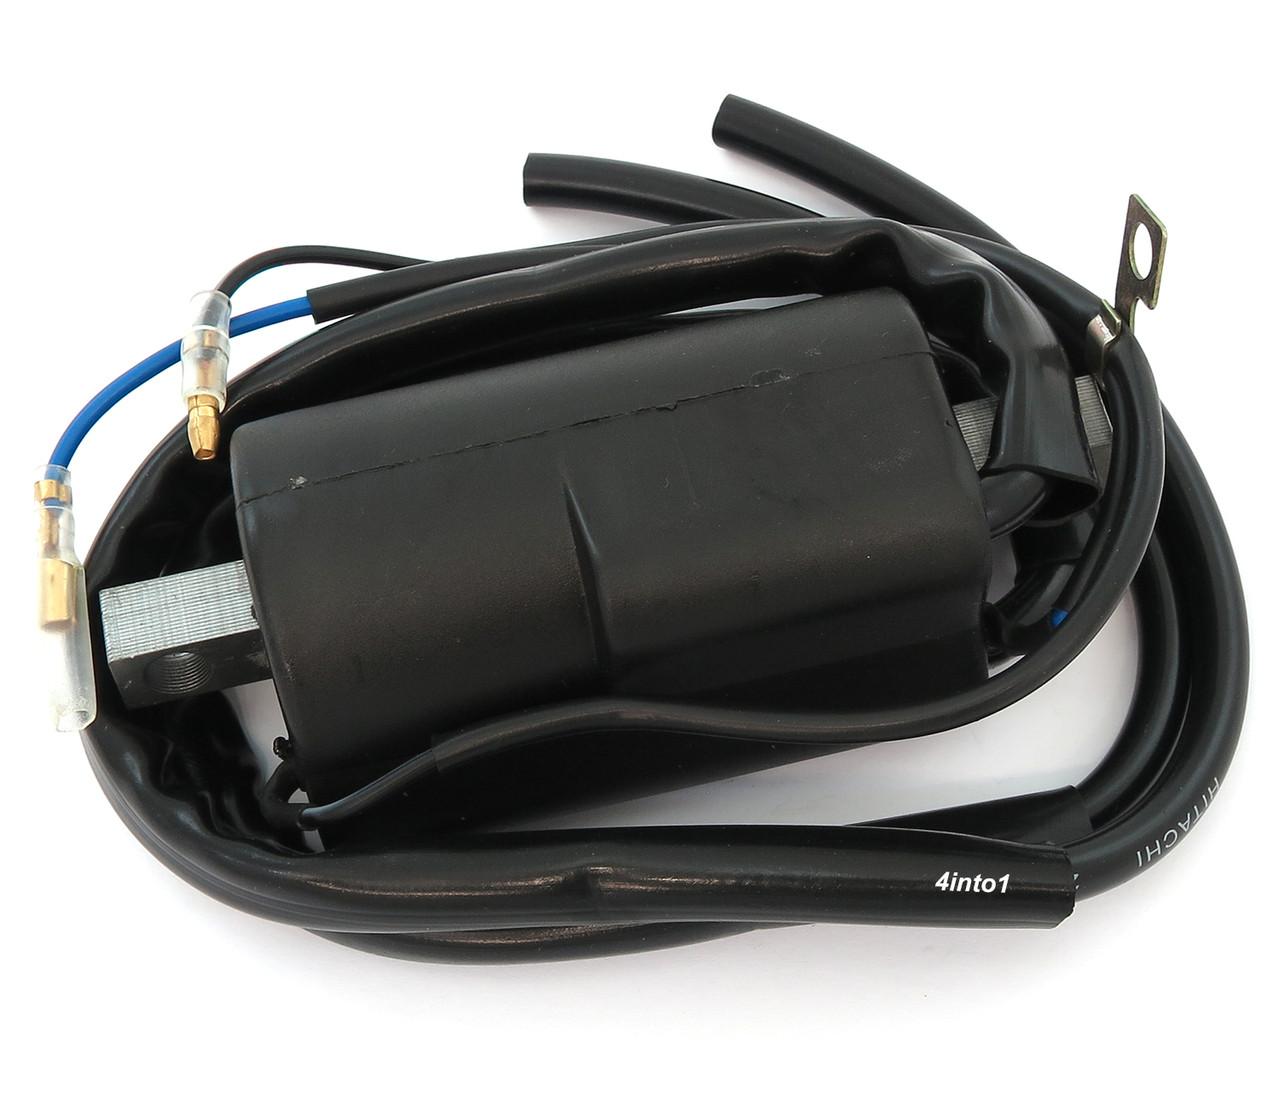 honda ignition coil 30501 300 003 cb350f 400f 500 550 750 cb500 coil wiring [ 1280 x 1114 Pixel ]